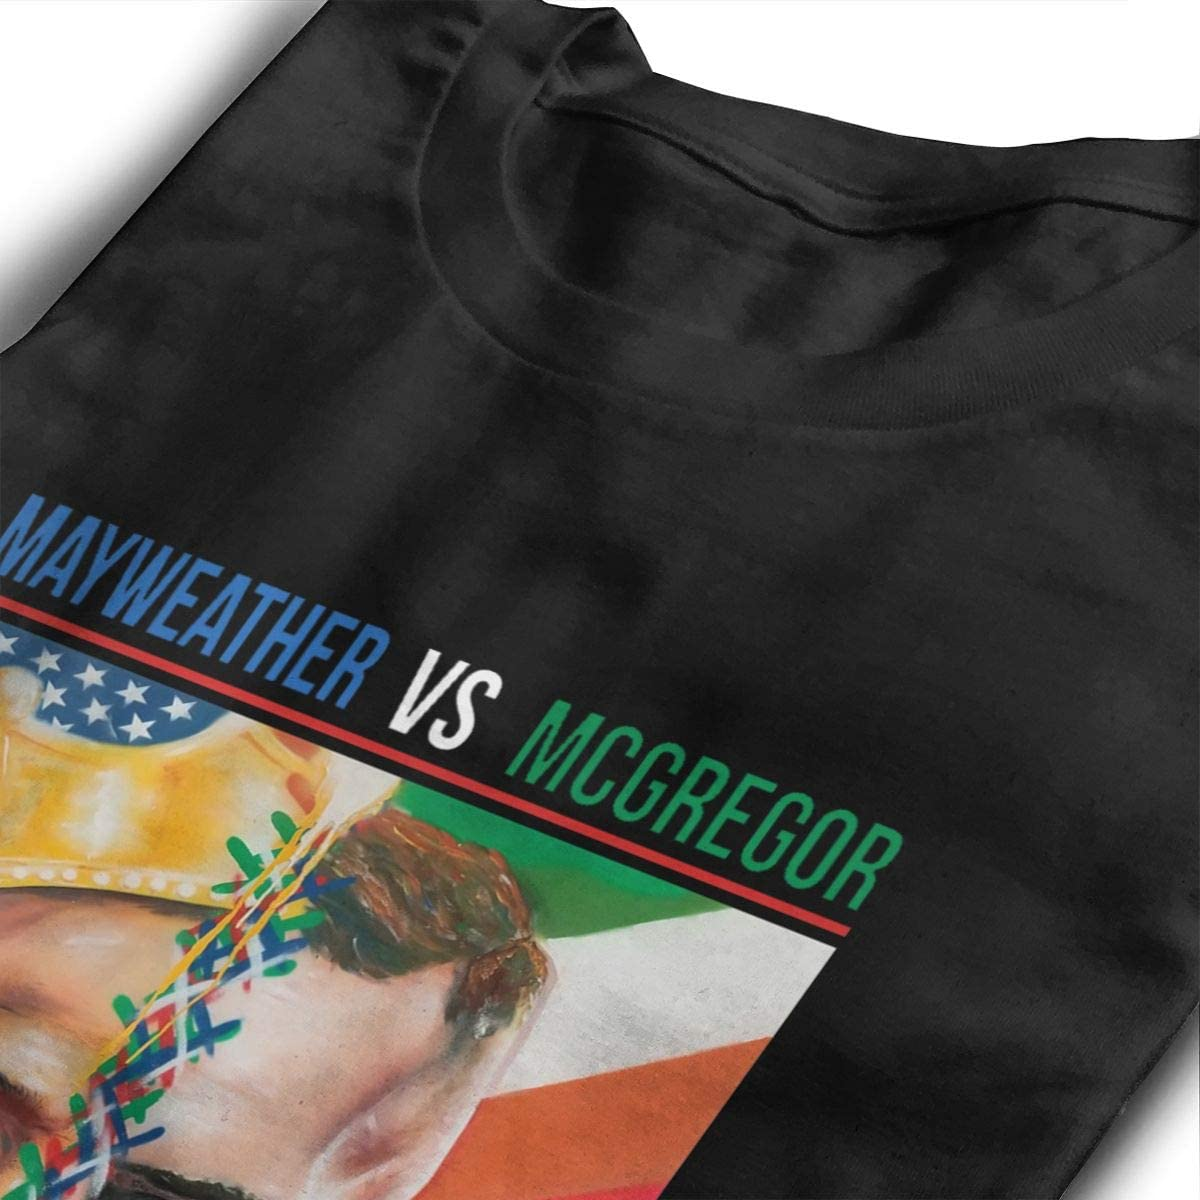 BilliePhillips Youngster Mayweather Vs McGregor Comfort Long Sleeve Tee Shirt